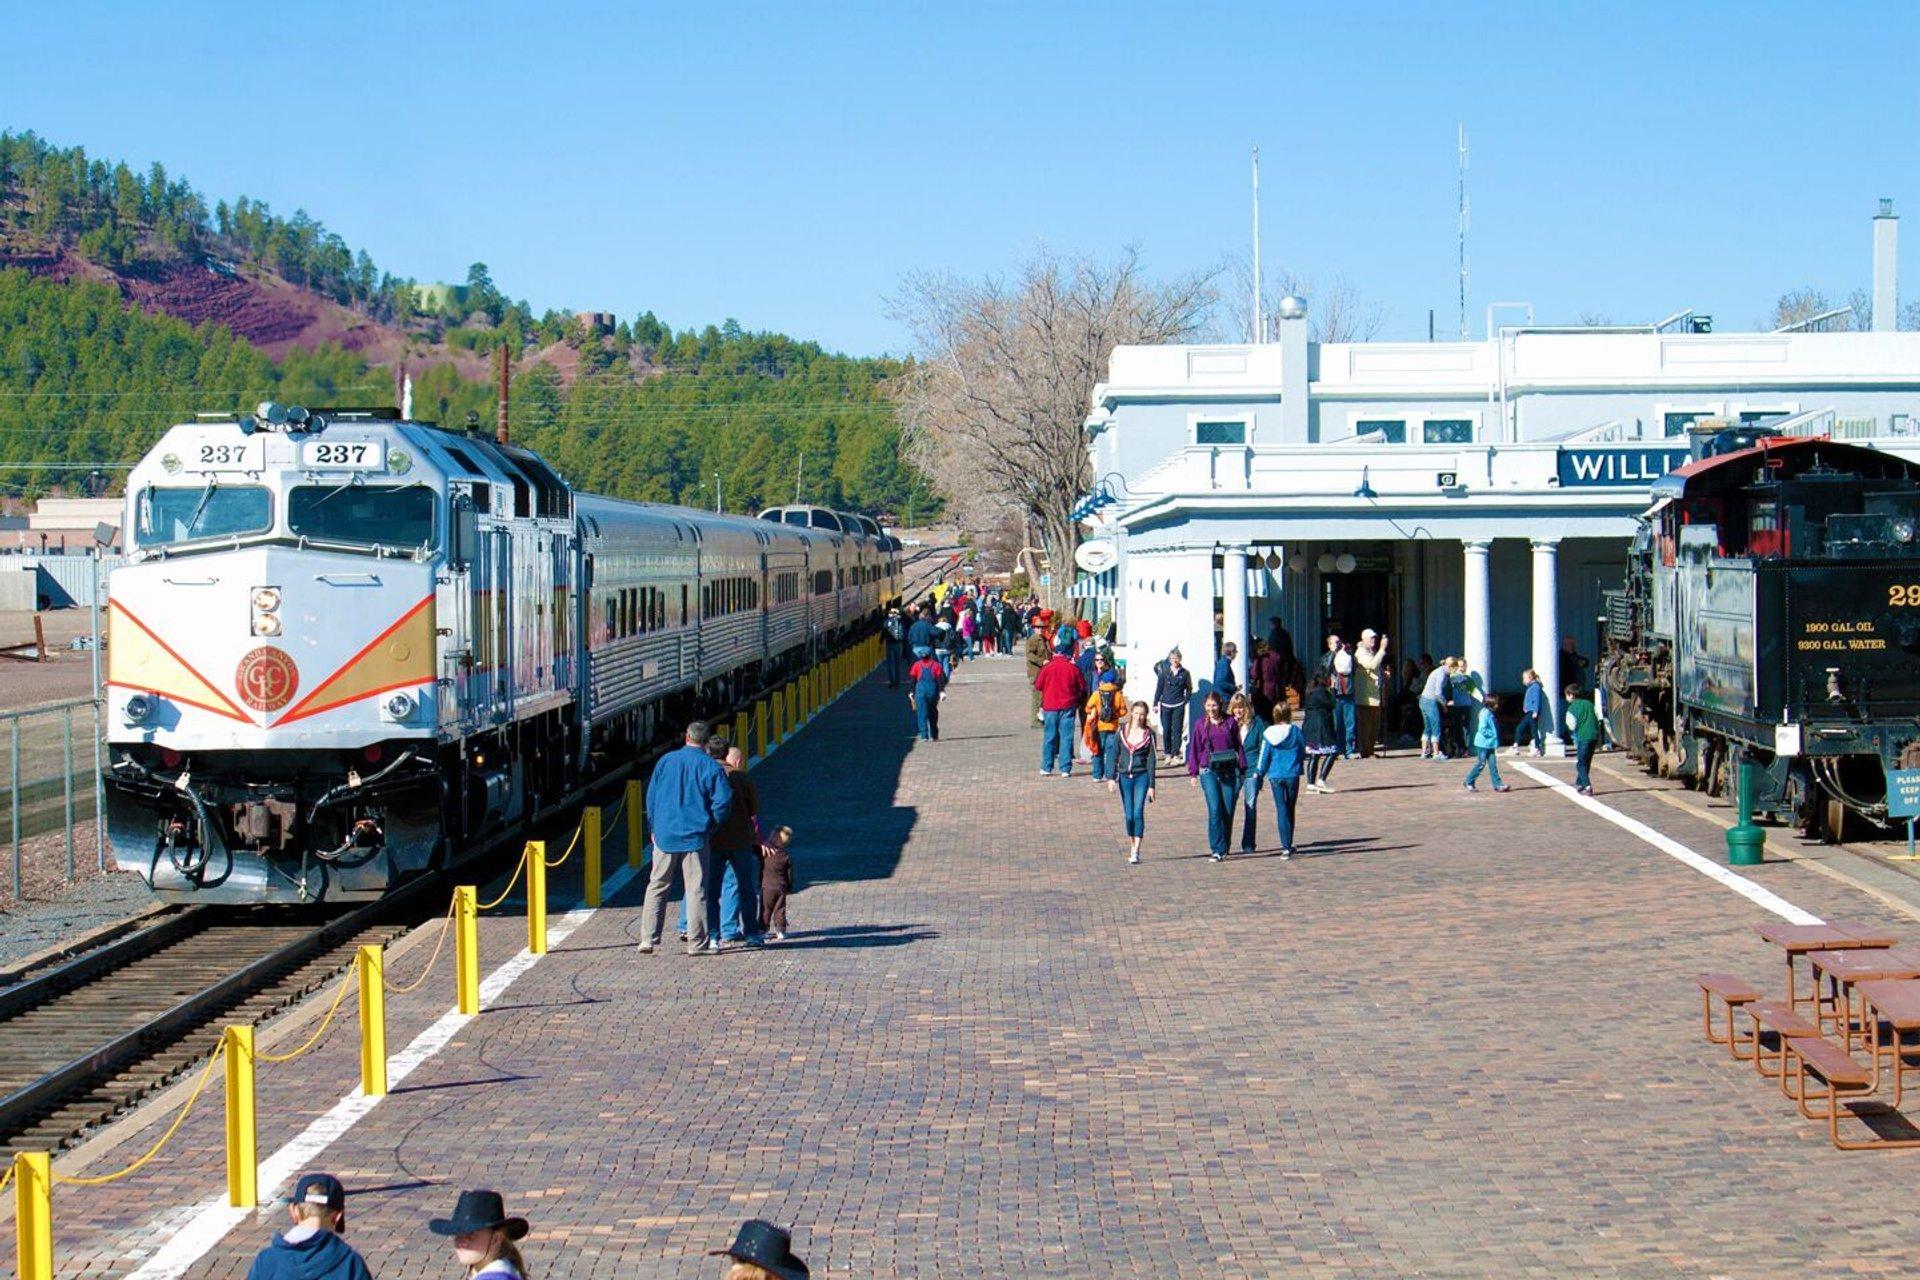 Train at Williams Depot 2020